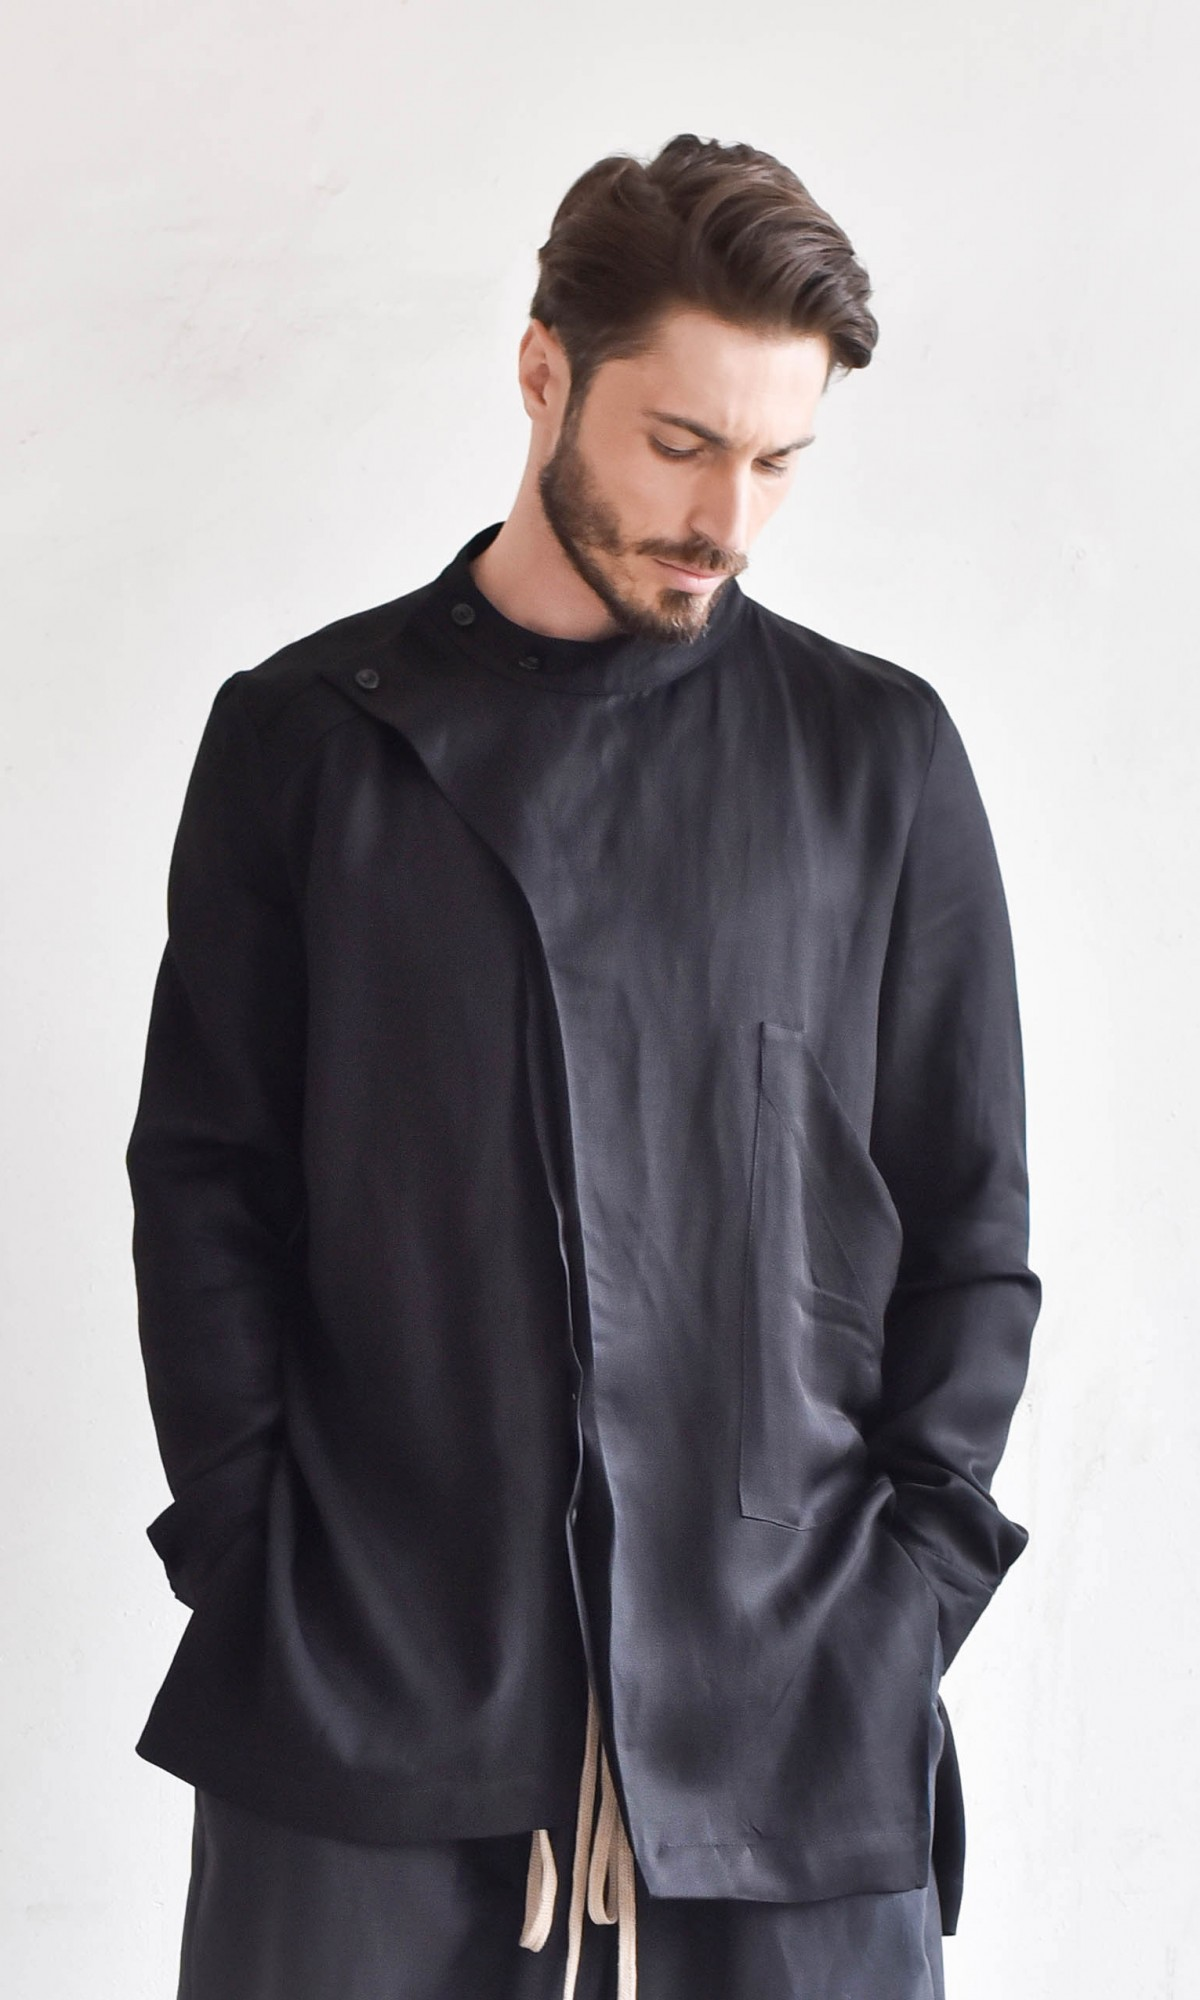 Asymmetric High Collar Loose Shirt A11706M